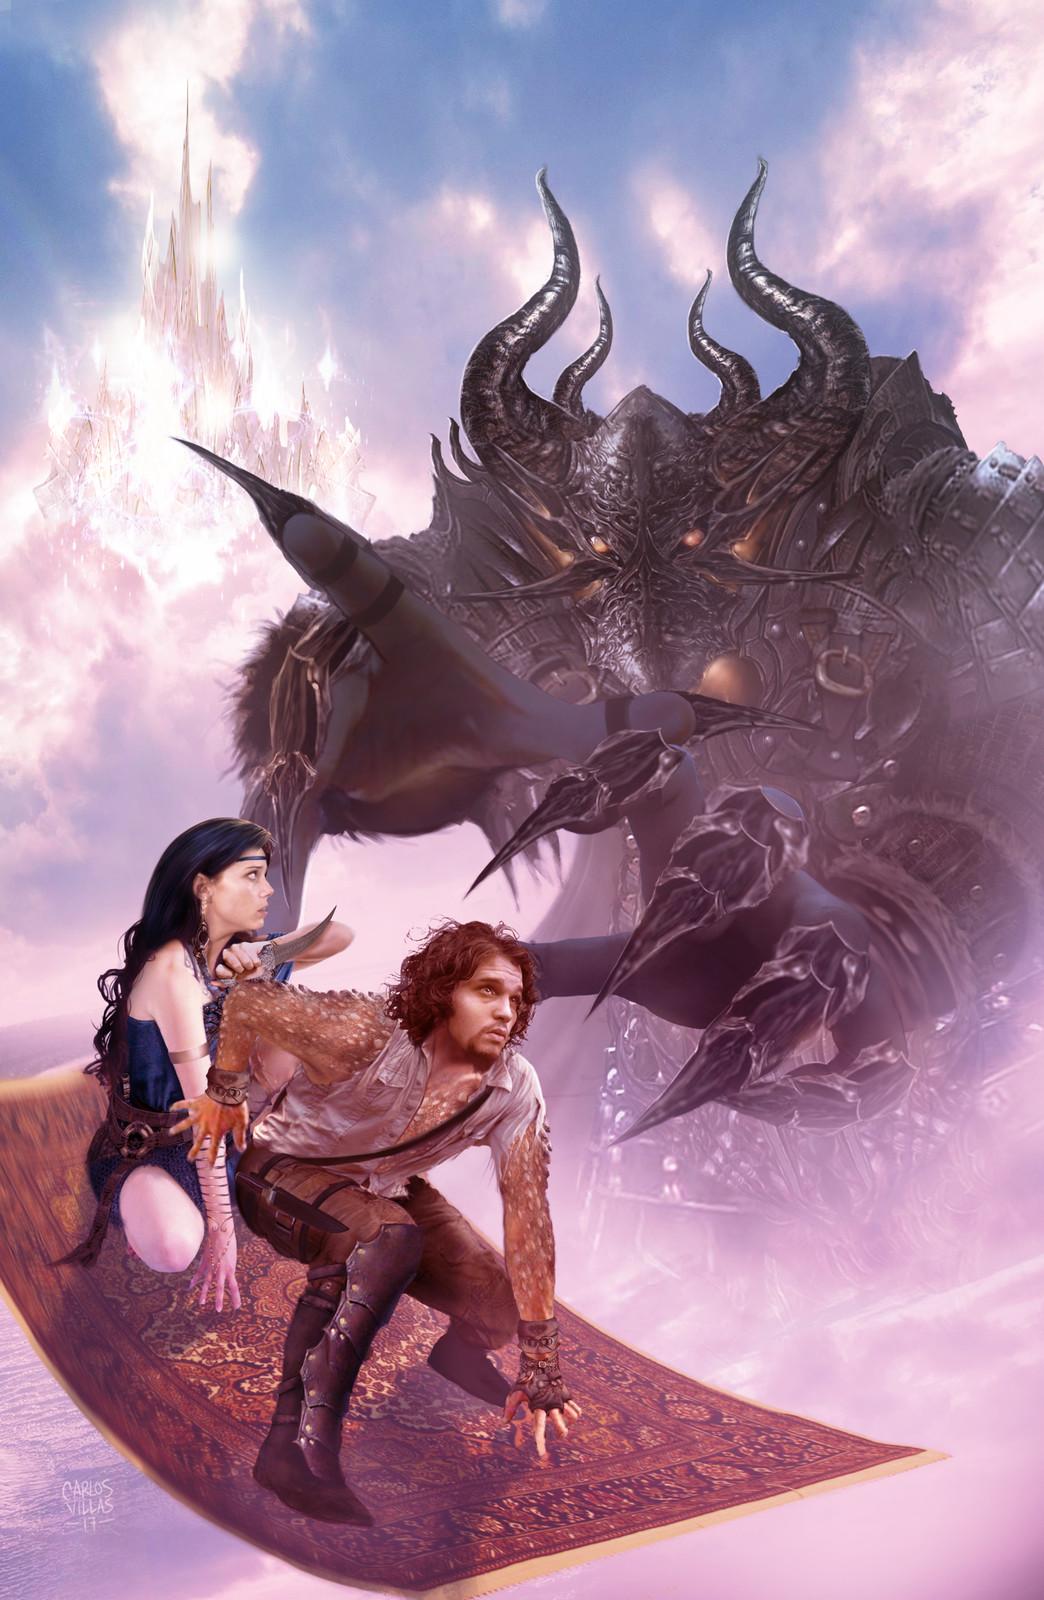 BATTLE DRAGONS COVER ILLUSTRATION